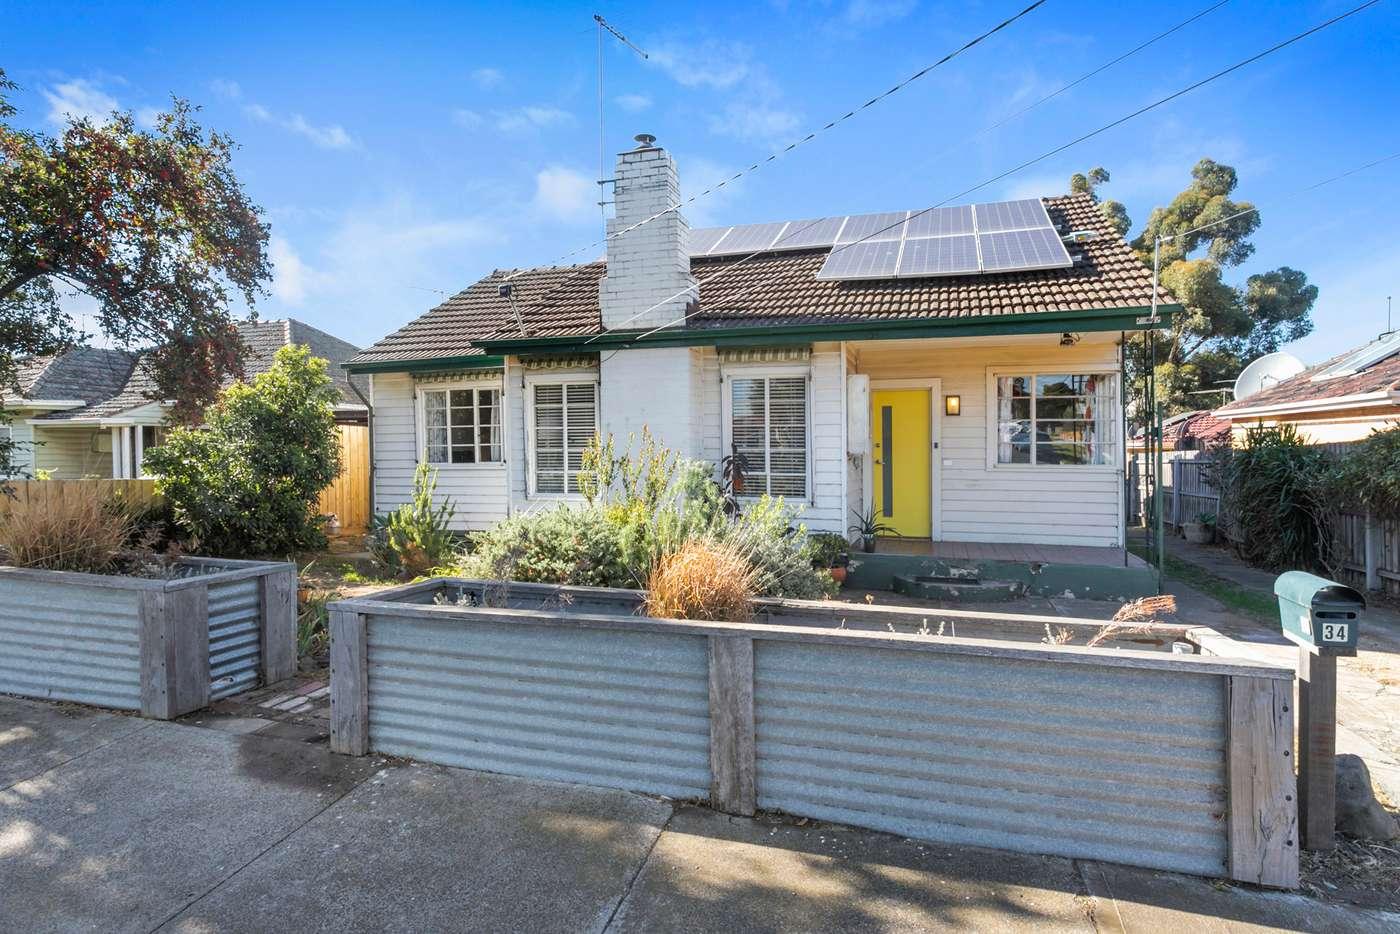 Main view of Homely house listing, 34 Mernda Street, Sunshine West VIC 3020